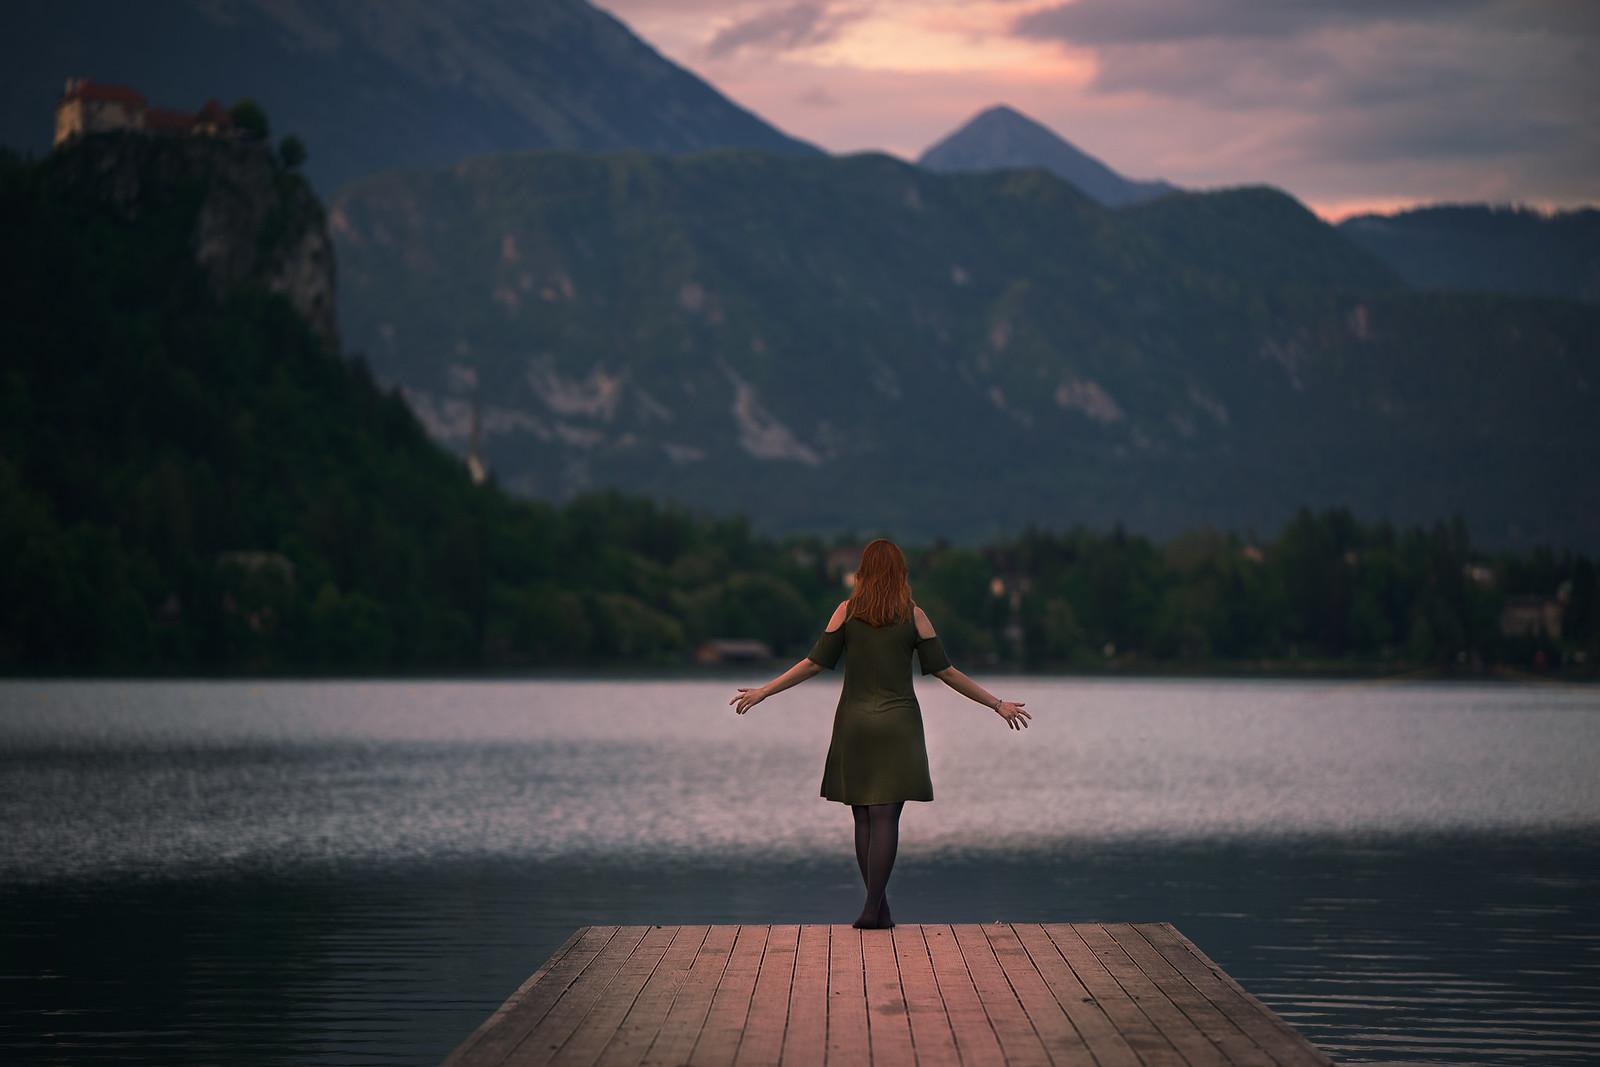 The call of the lake